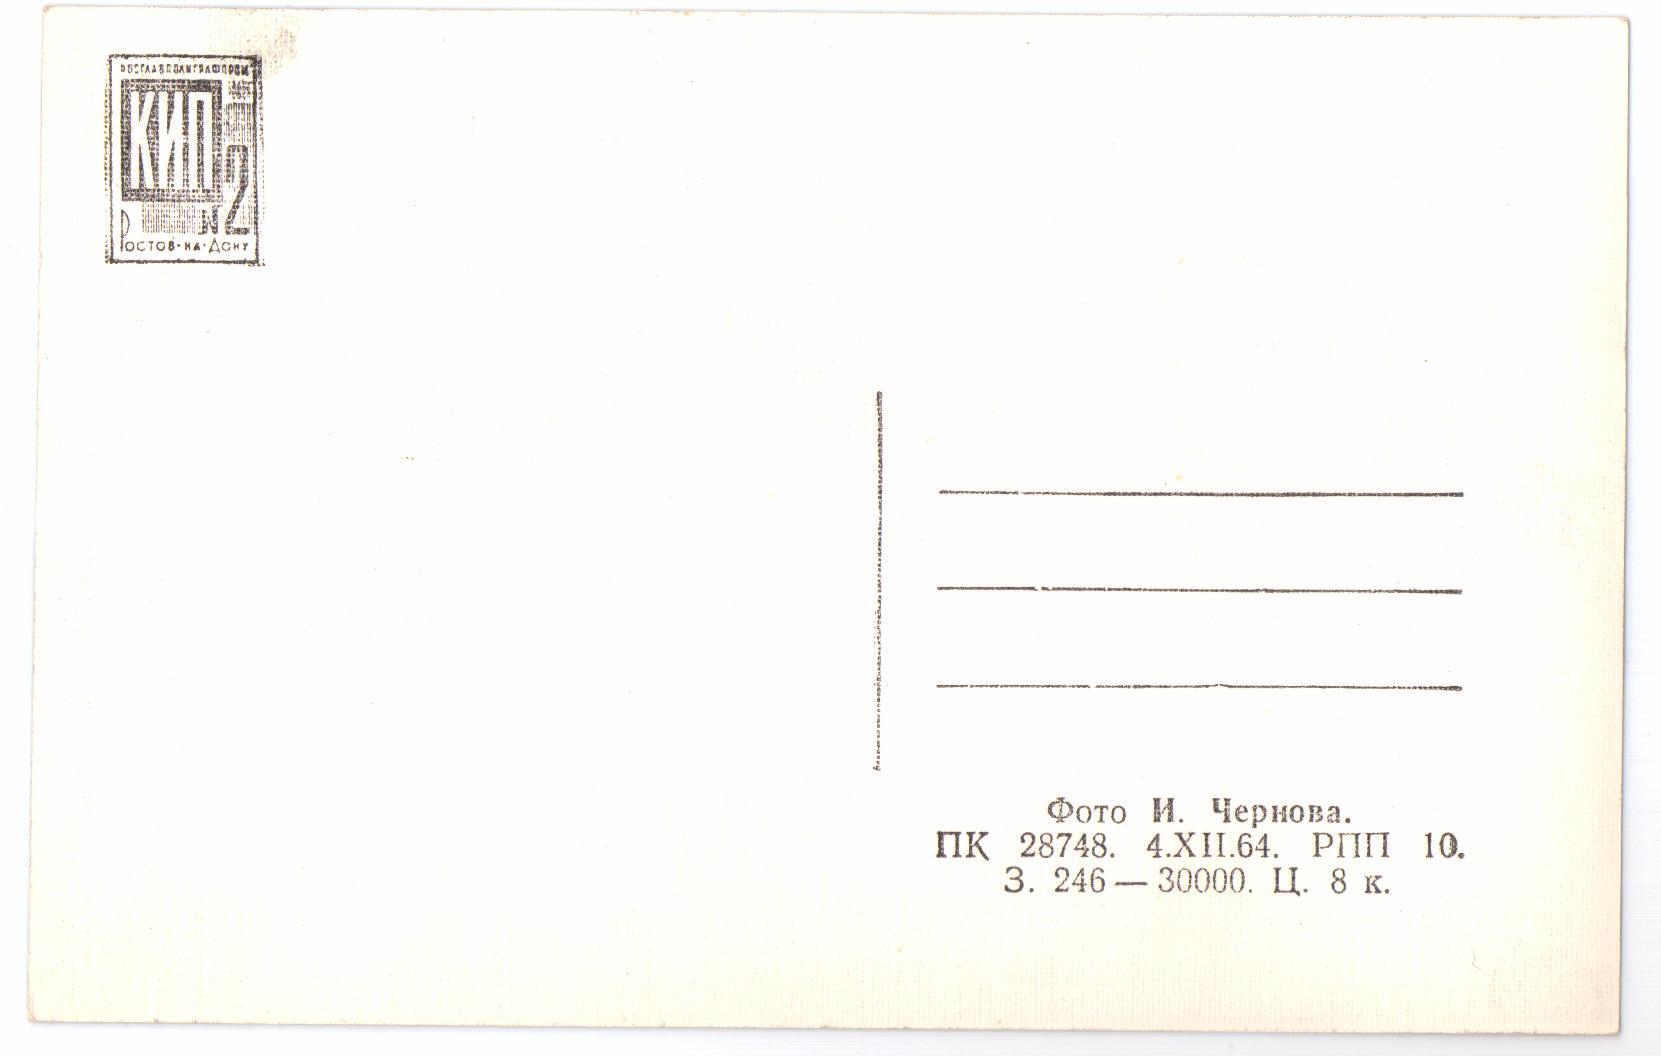 kip-246-2